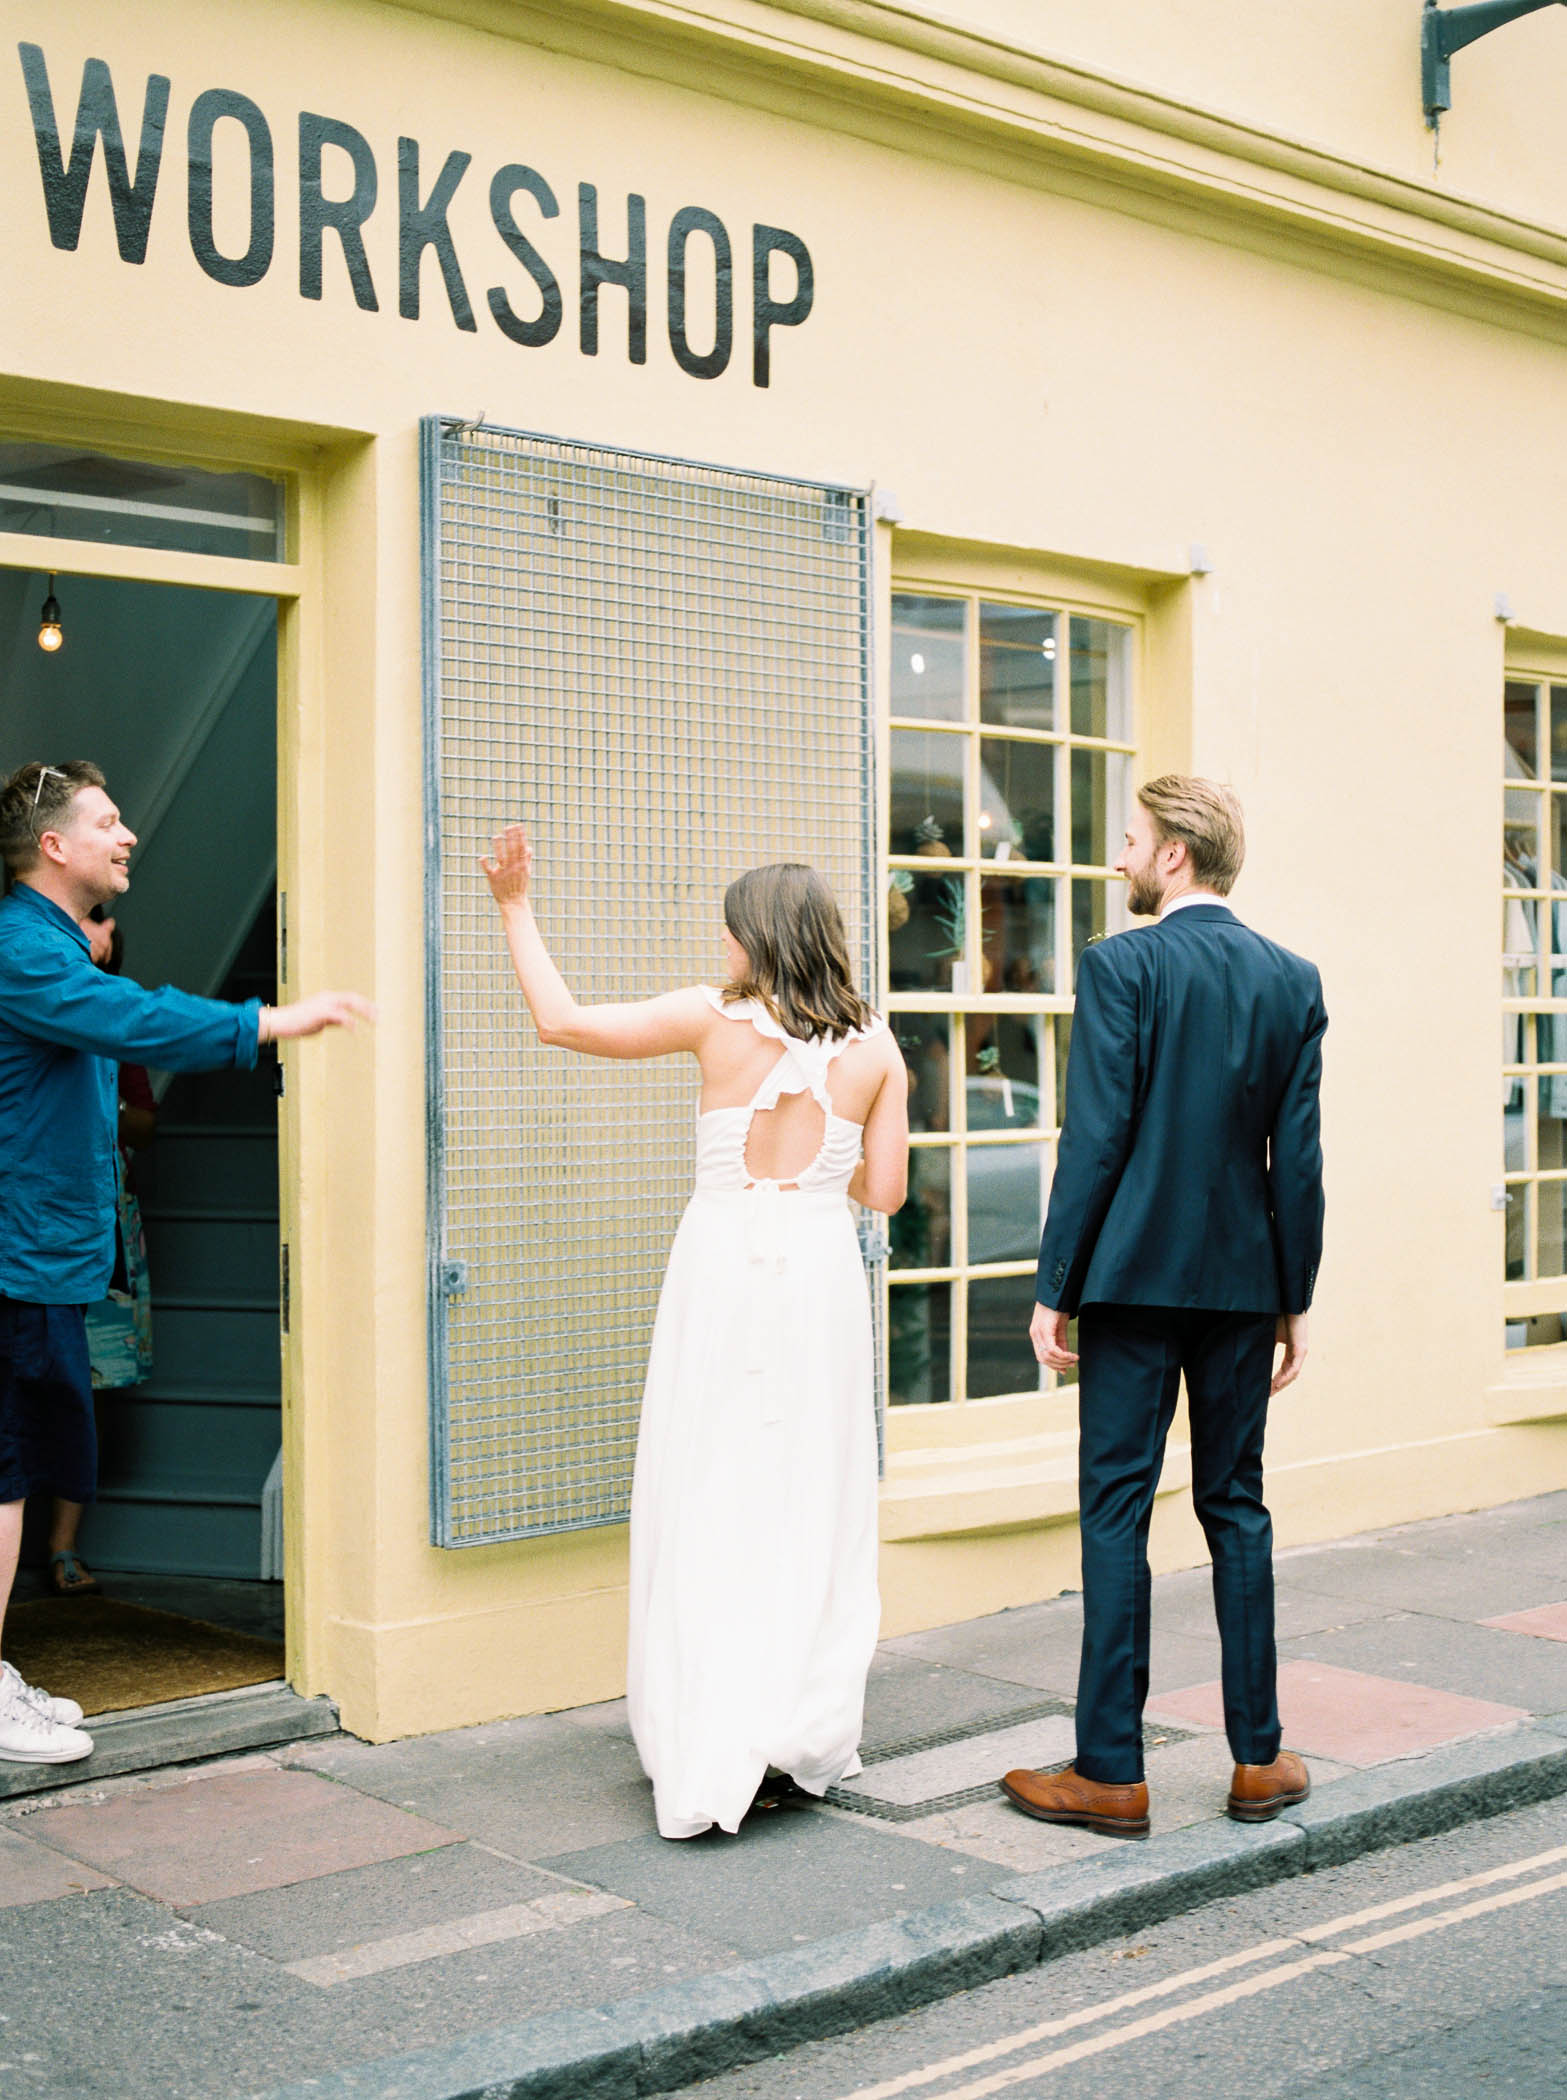 The Anna Edit Wedding Workshop Brighton